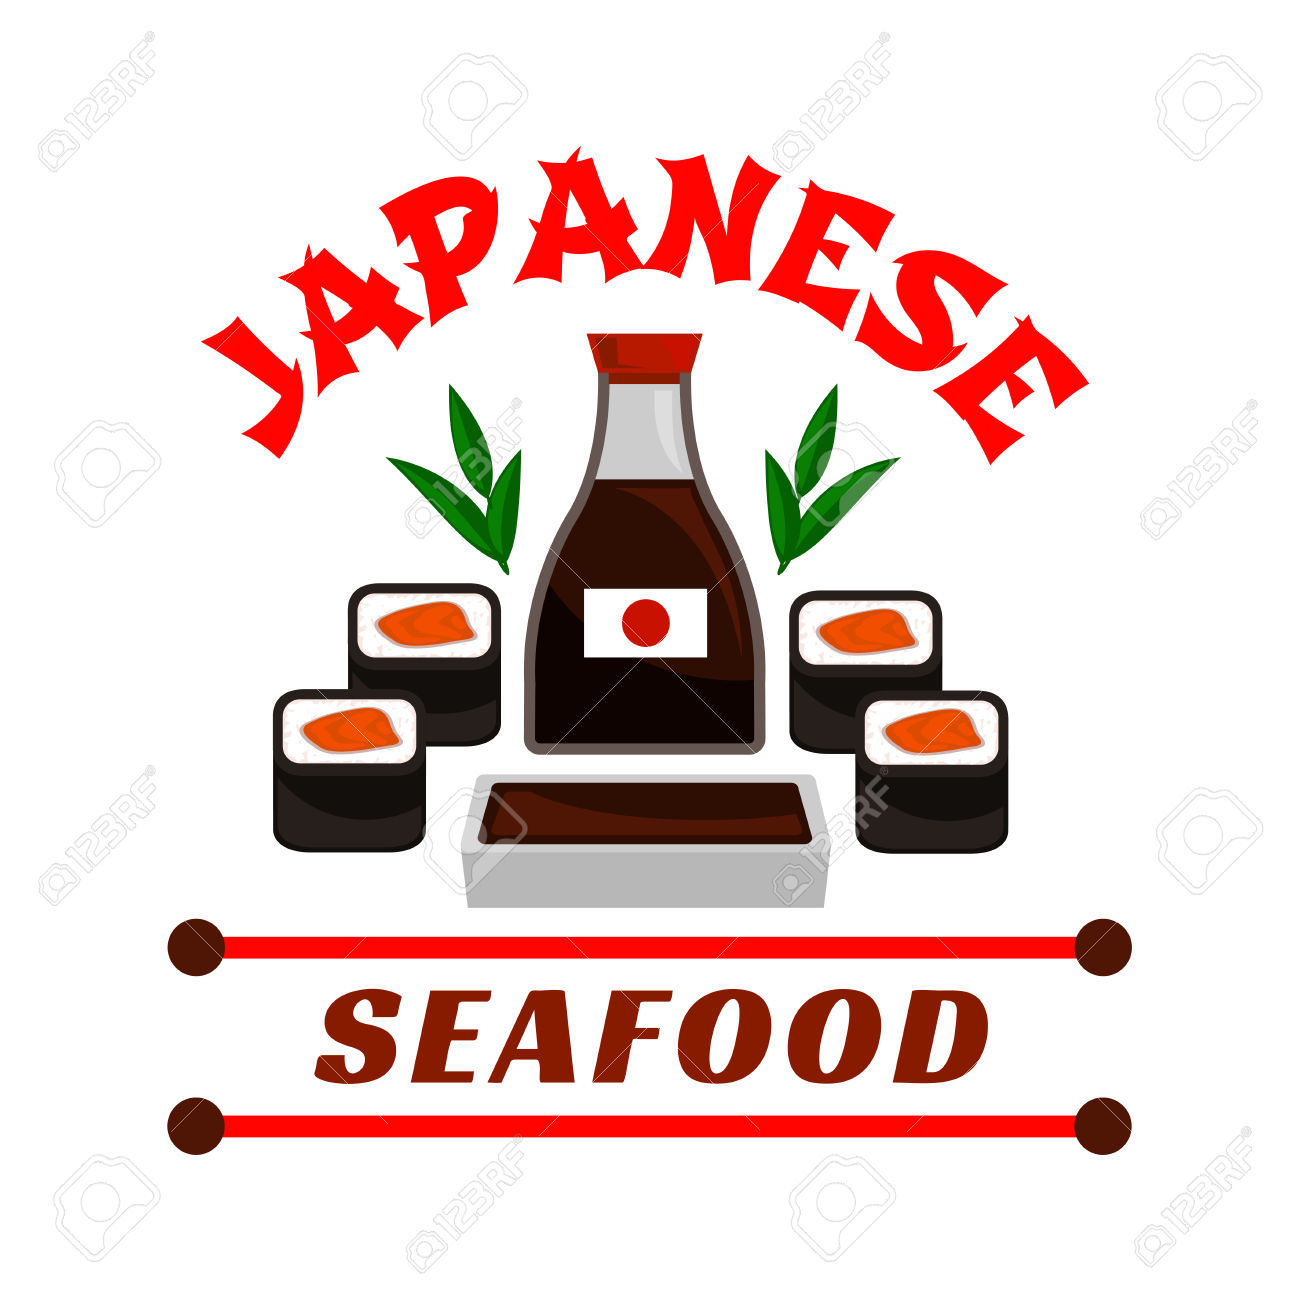 Japanese Seafood Restaurant Emblem. Sushi Rolls And Sauce Bottle.